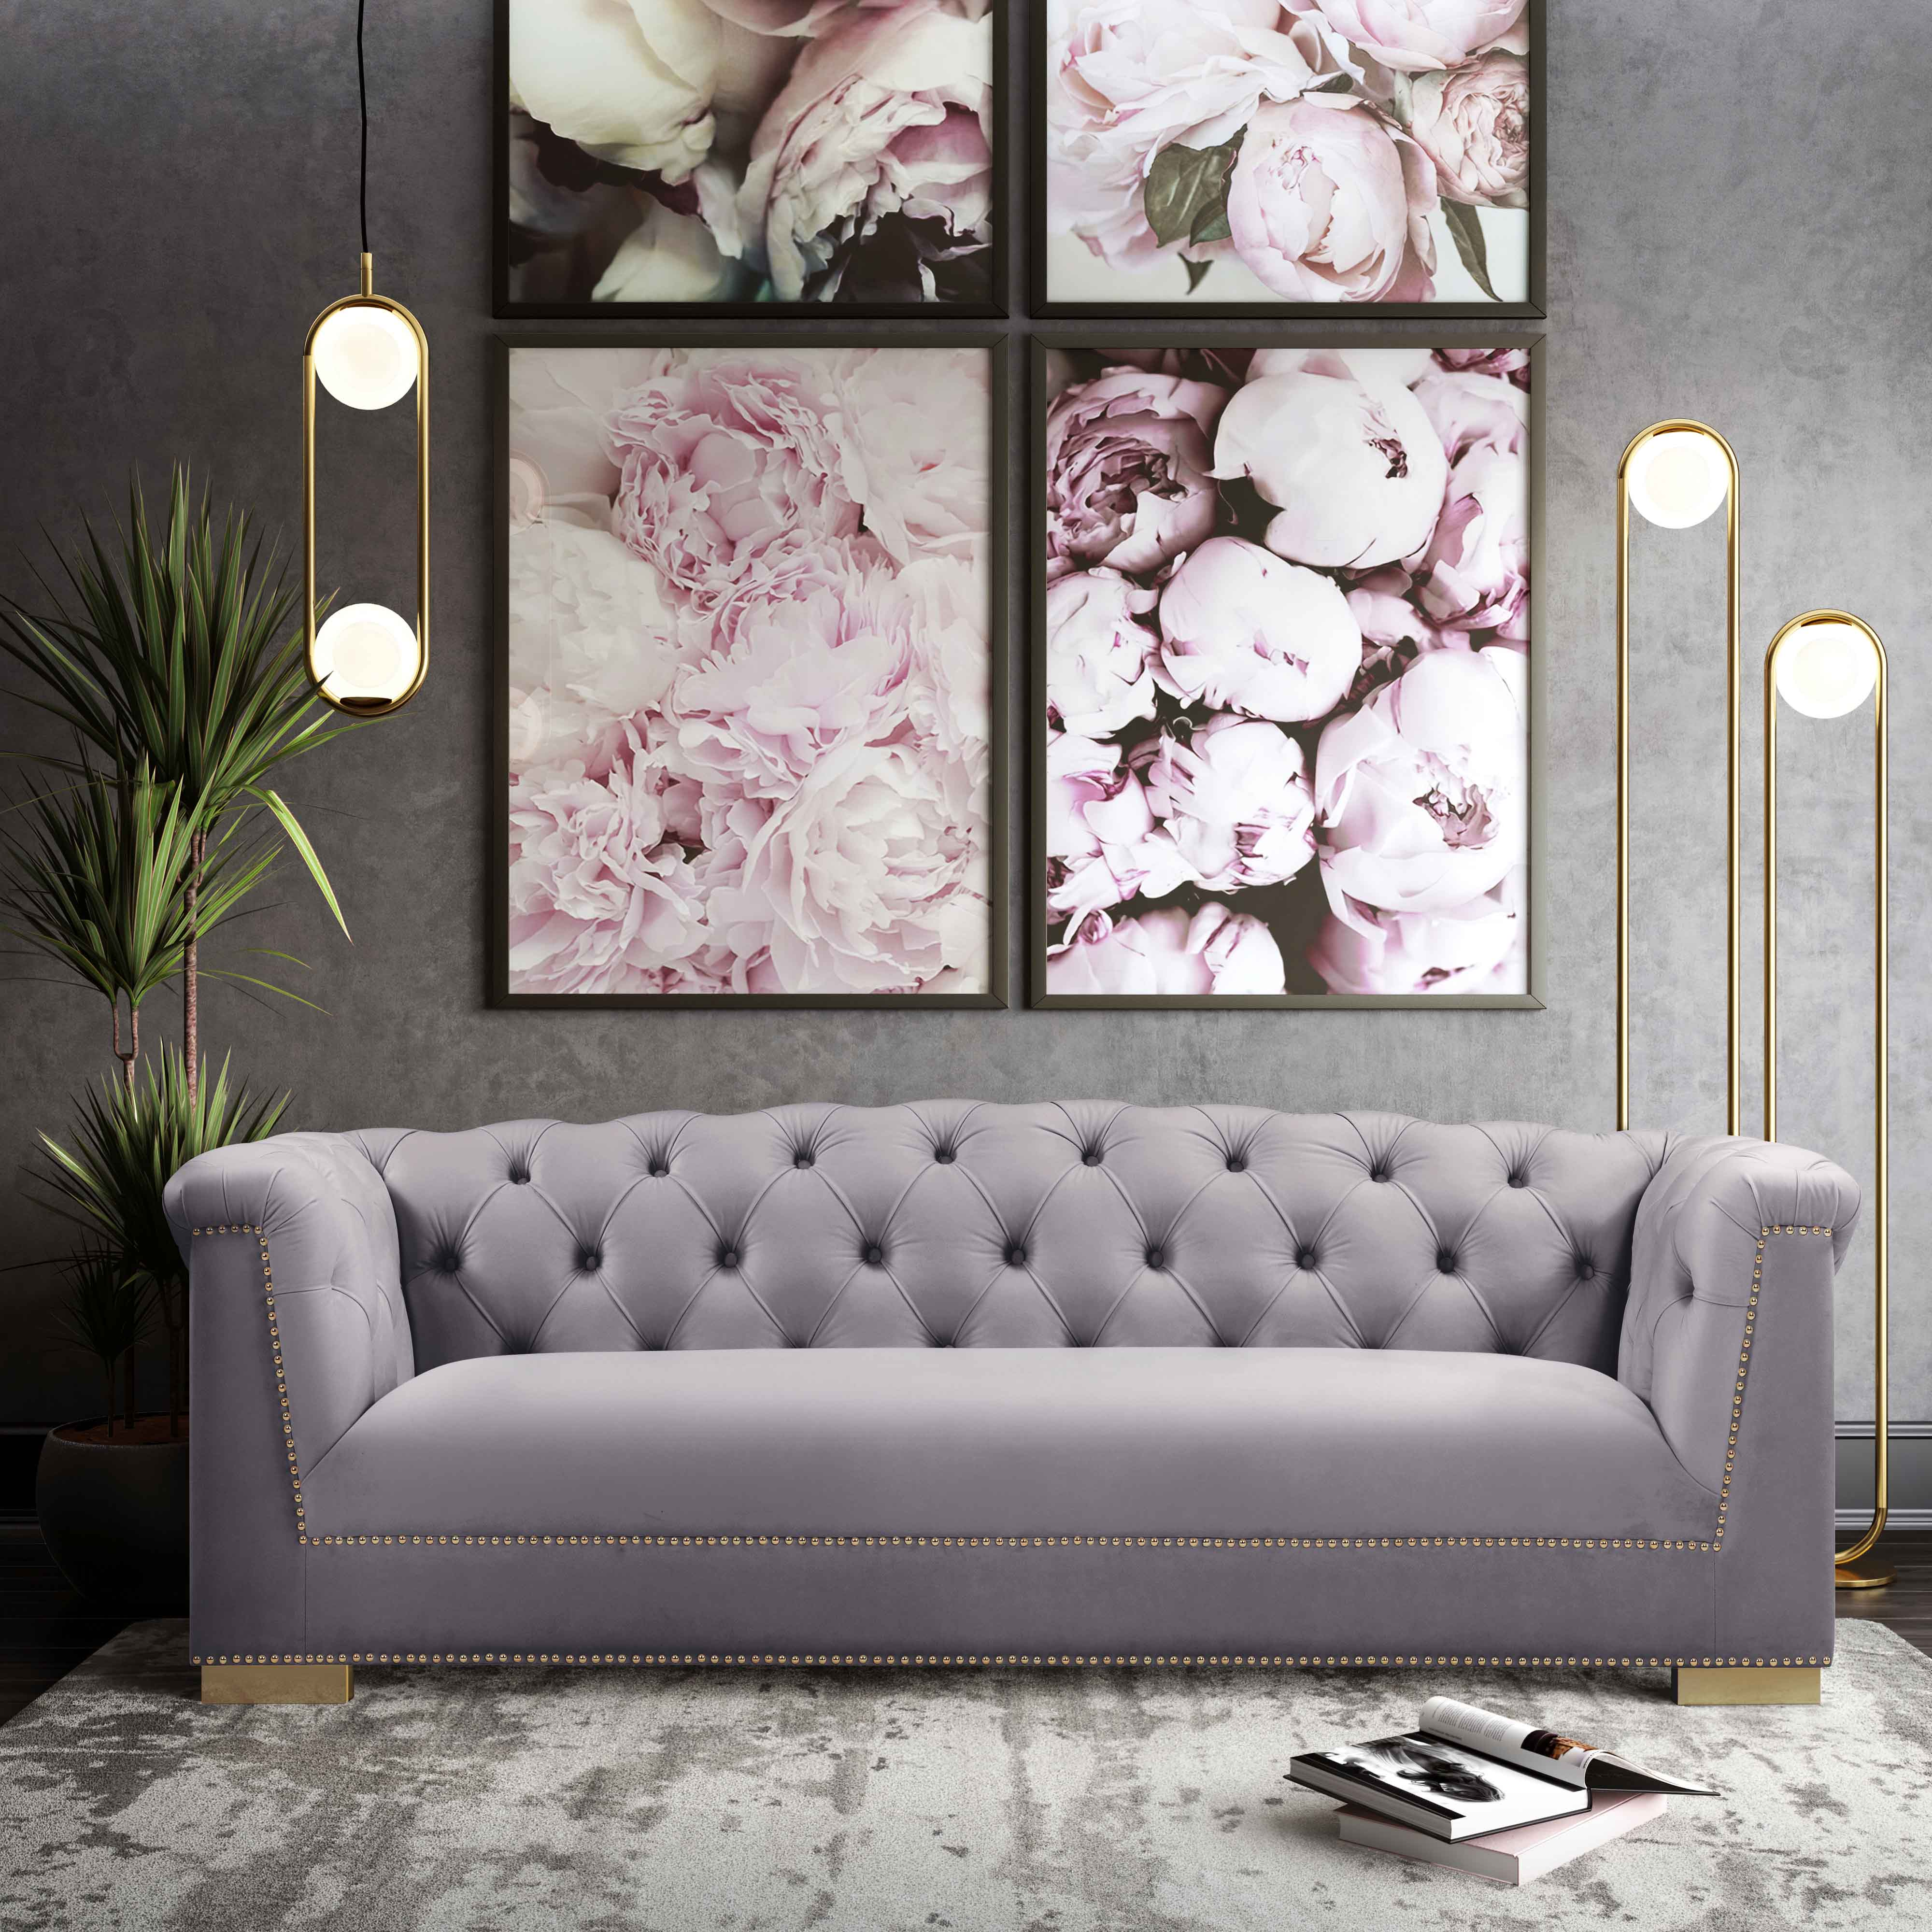 Farah Grey Velvet Sofa By Inspire Me Home Decor Tov Furniture